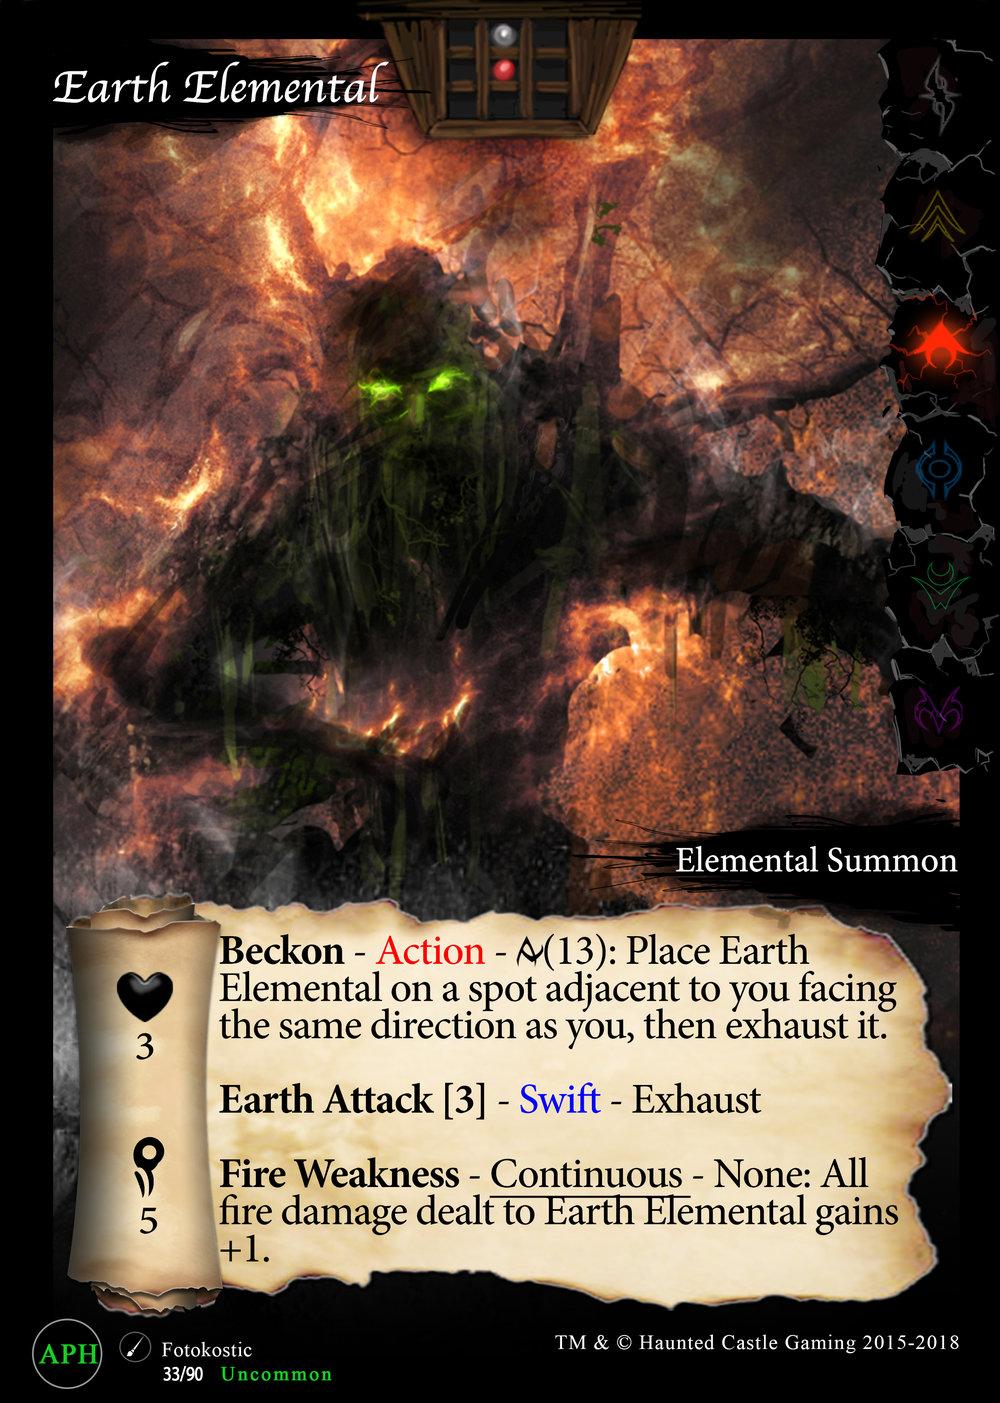 33-Earth Elemental.jpg